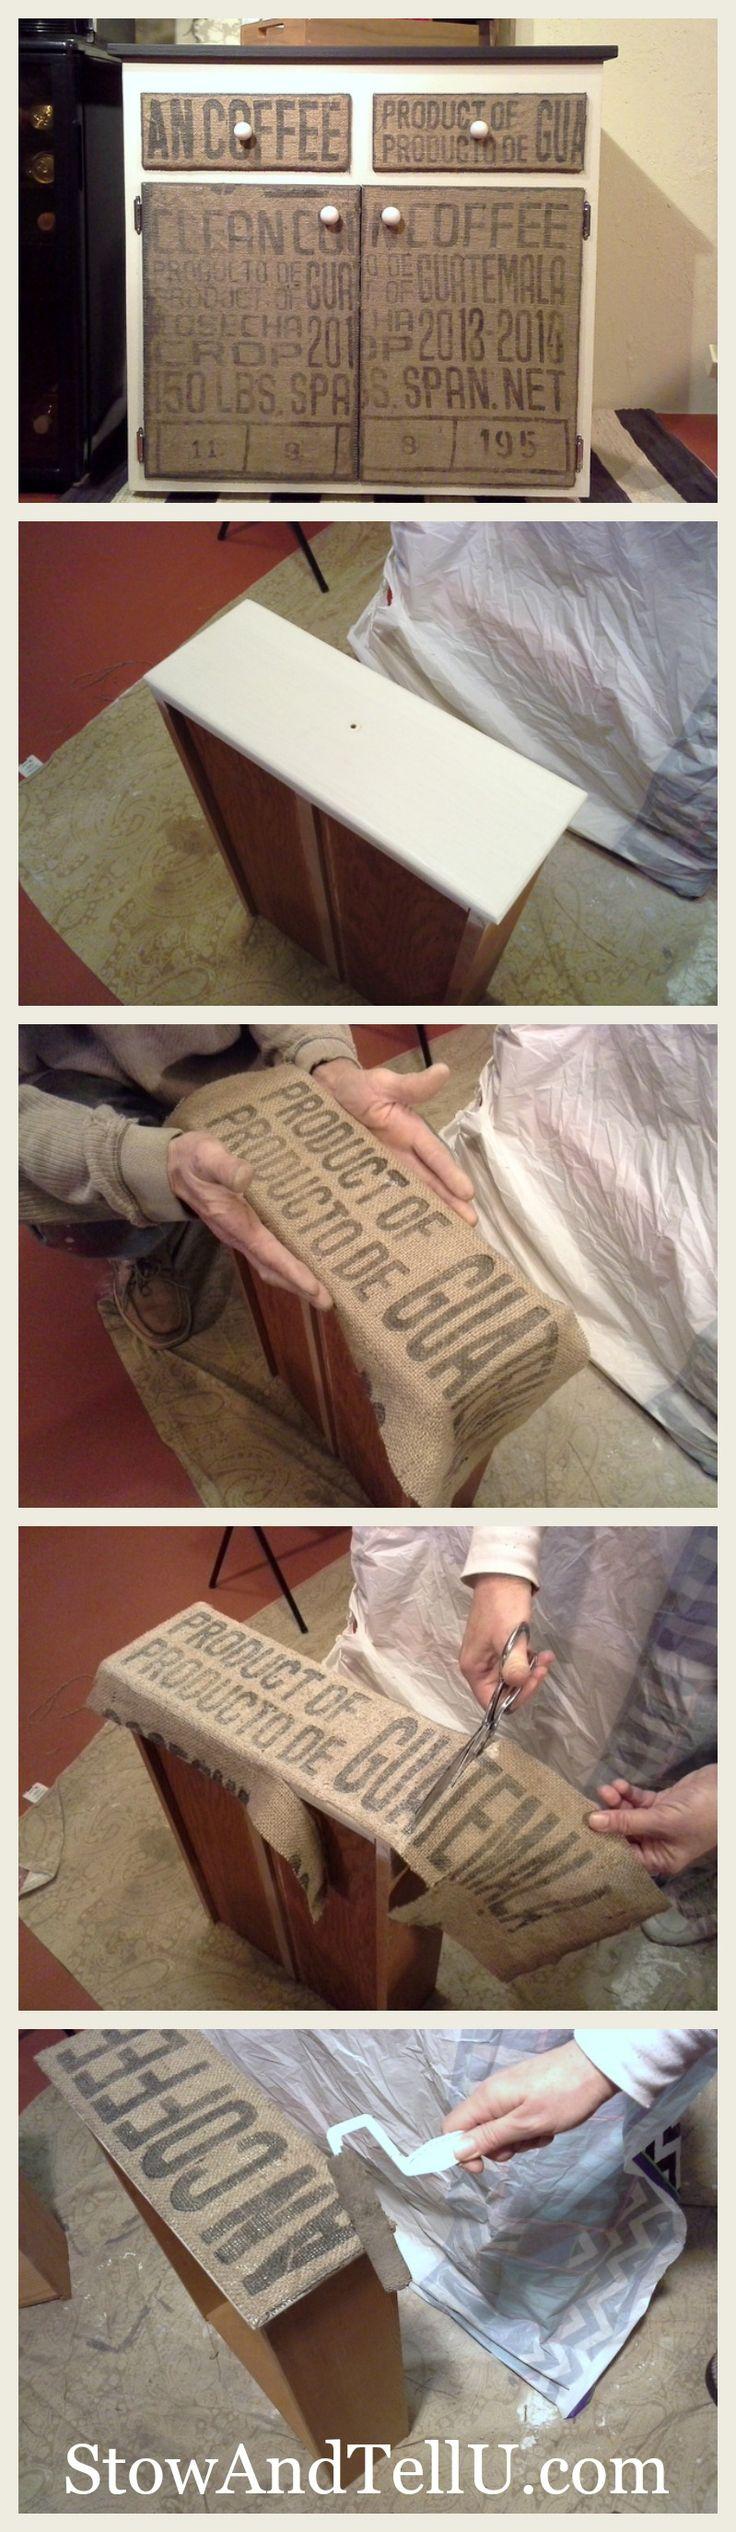 DIY Decoupaged Coffee Sack Furniture Cabinet | Stow&TellU